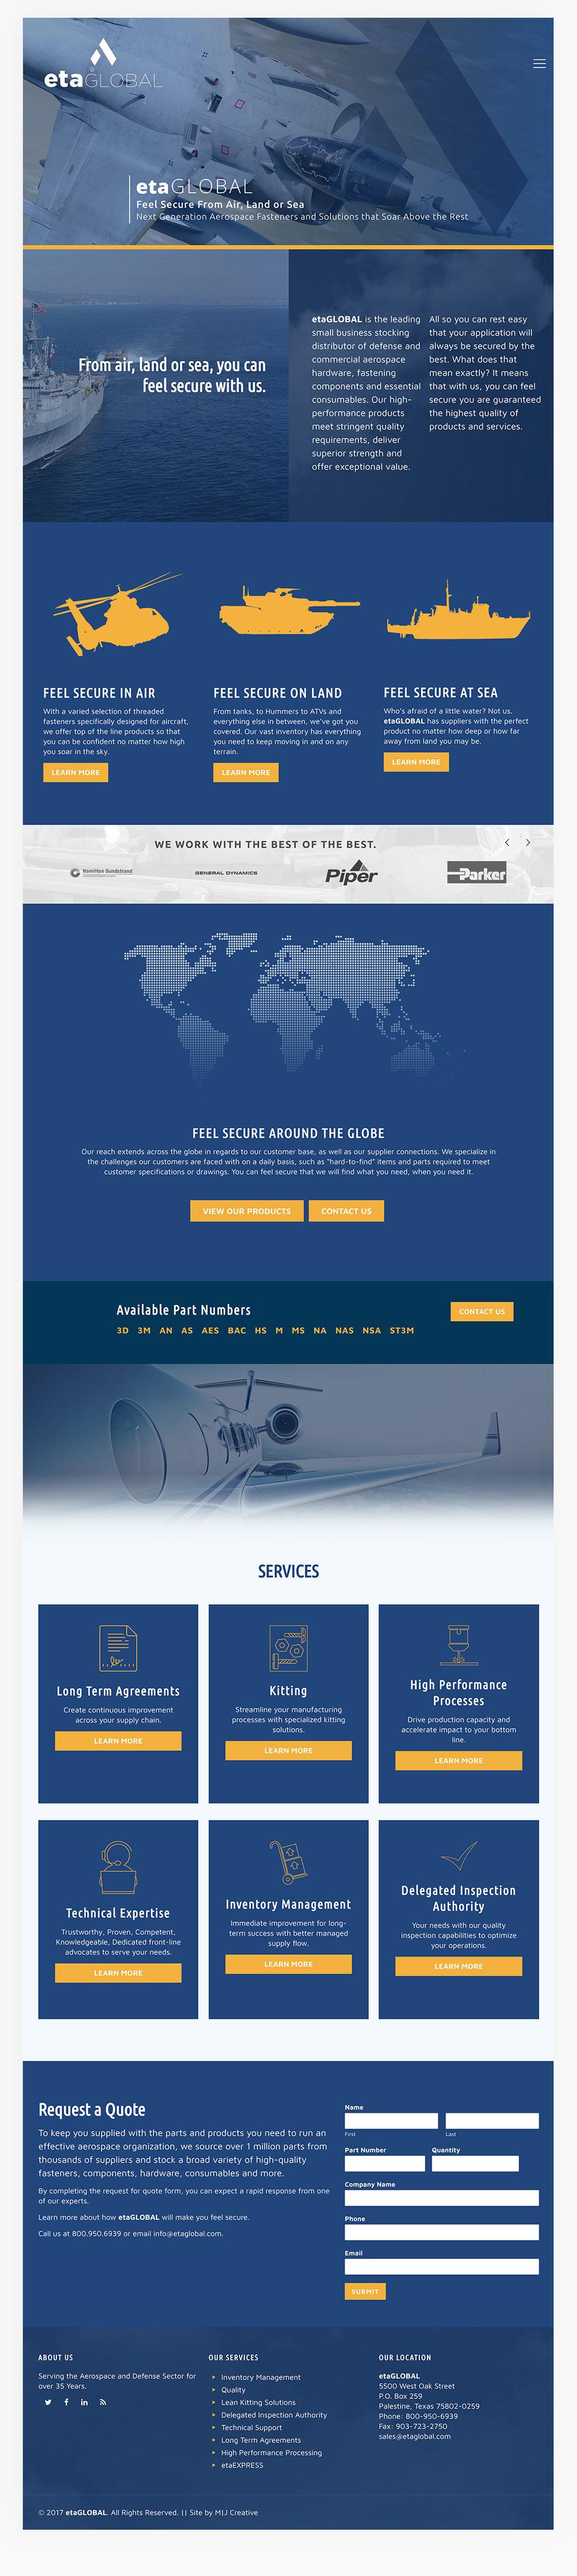 waco-texas-web-design.jpg